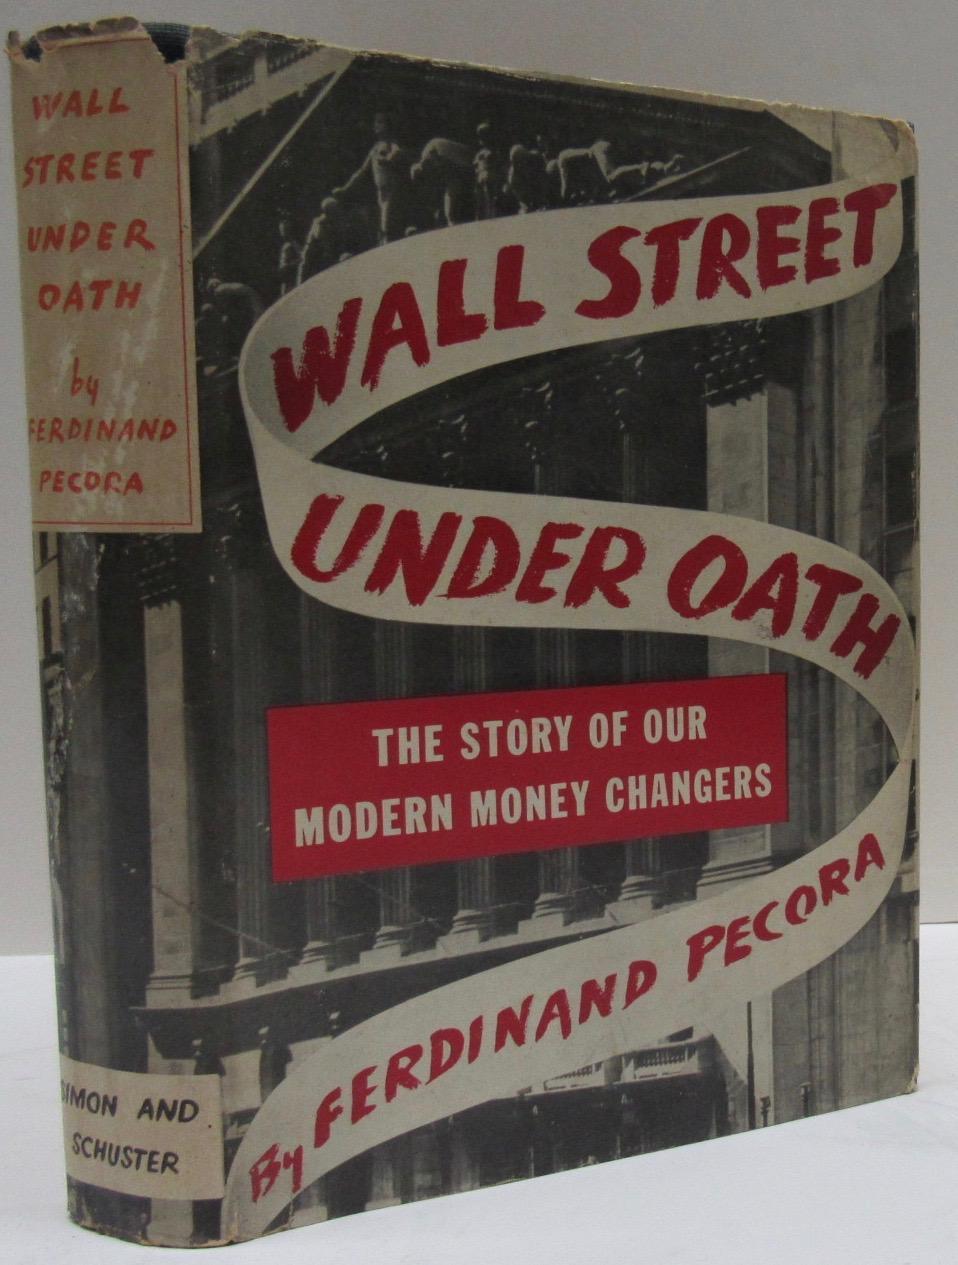 Wall Street Under Oath The Story of Our Modern Money Changers Pecora Ferdinand [Near Fine] [Hardcover] (bi_30406171819) photo